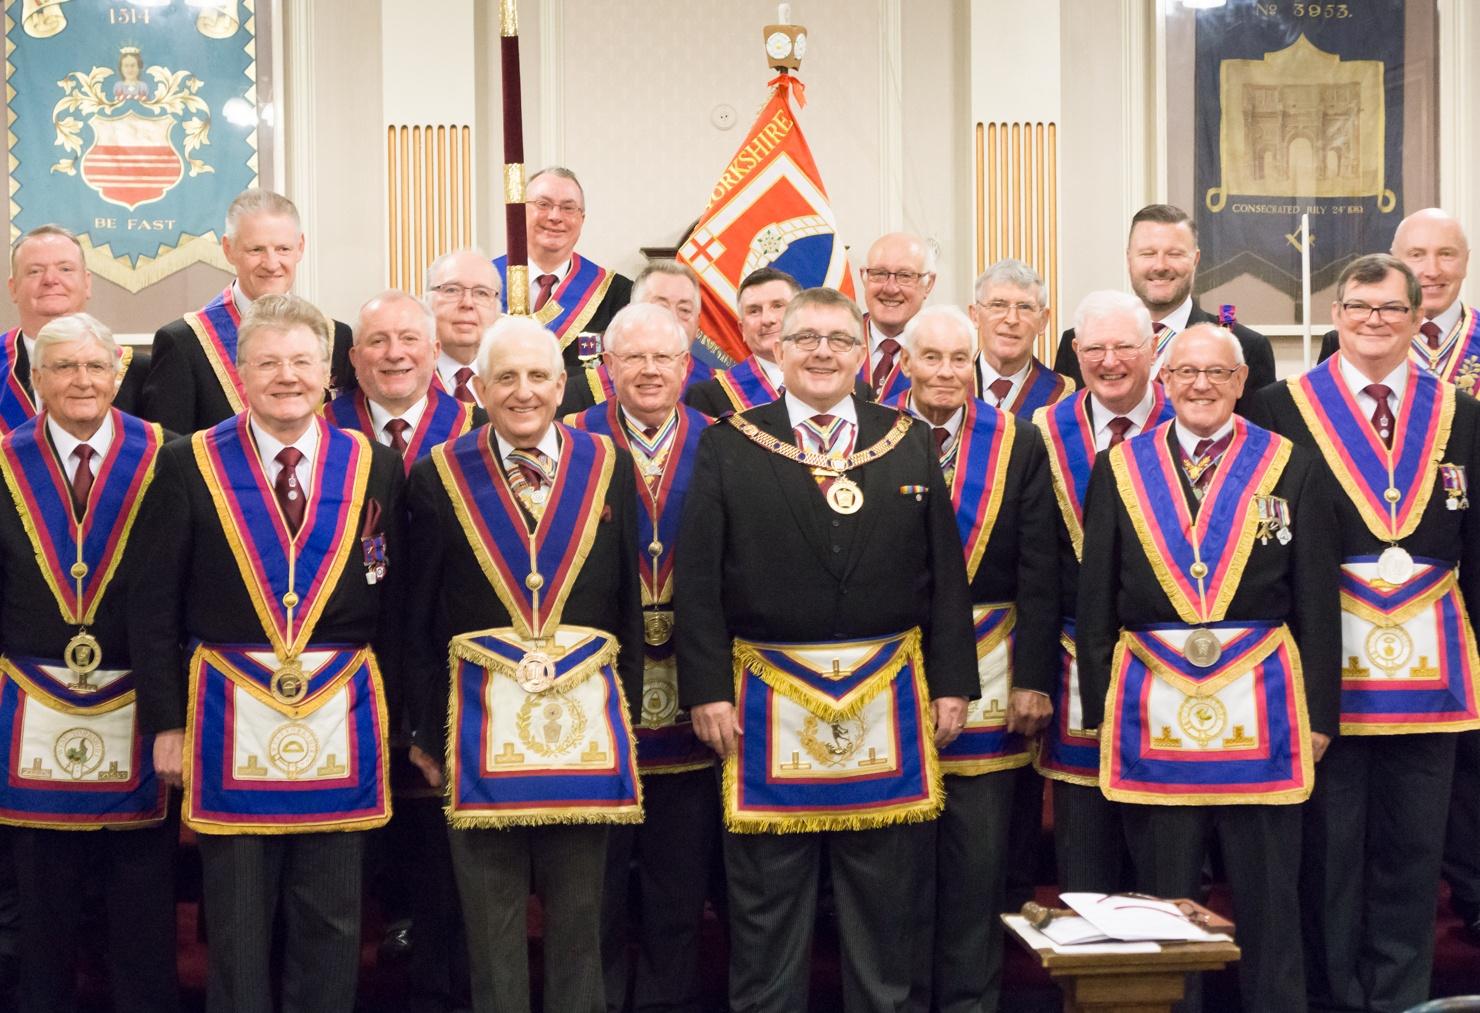 Escorted Visit to Prince Edward Lodge of Mark Master Masons No.14